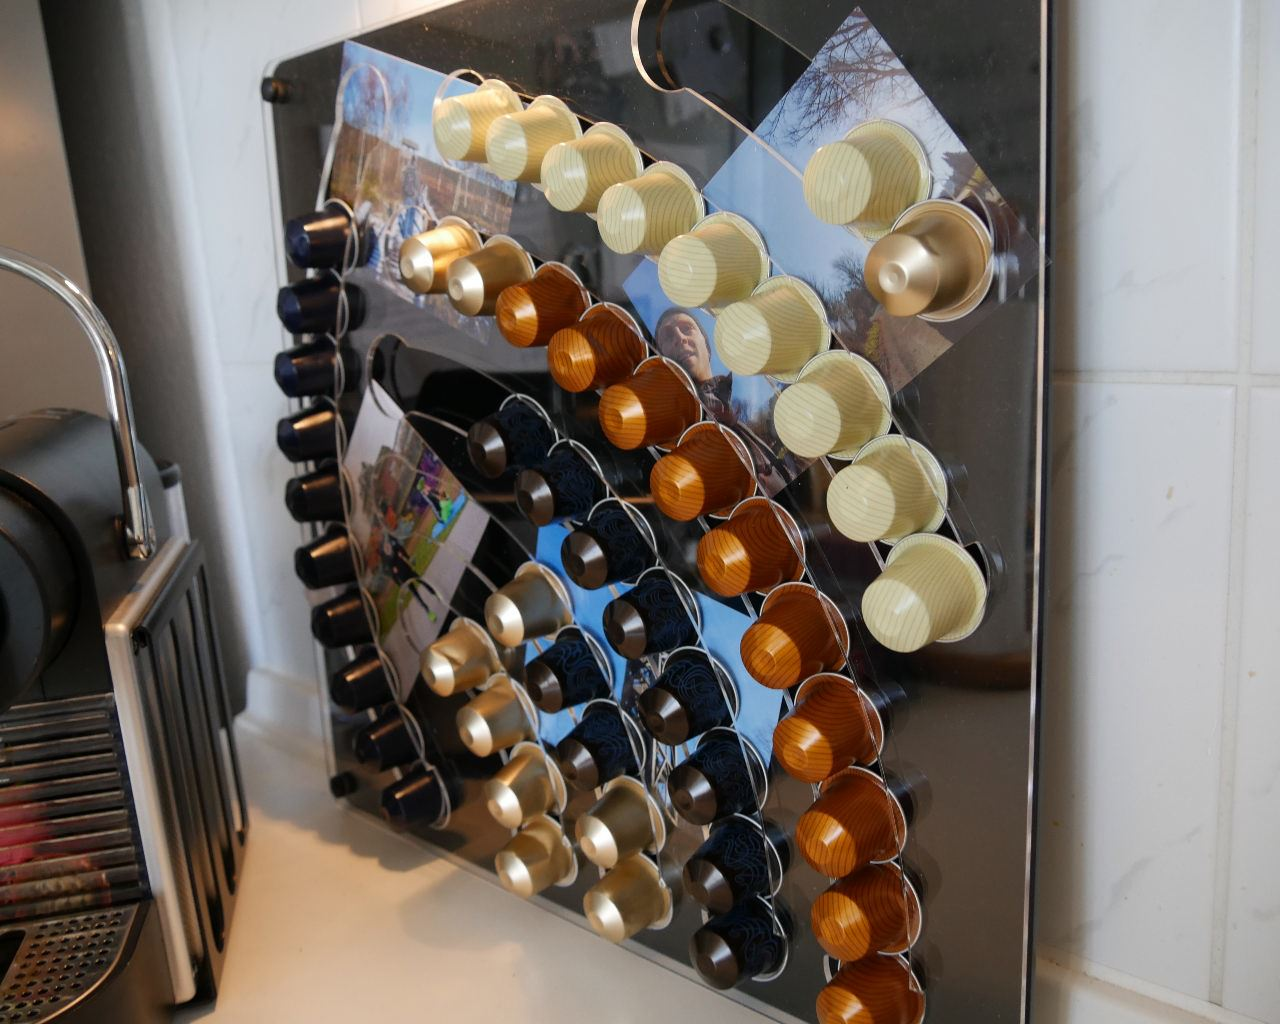 kapselhalter wasserfall f r nespresso kapseln im test kapsel. Black Bedroom Furniture Sets. Home Design Ideas